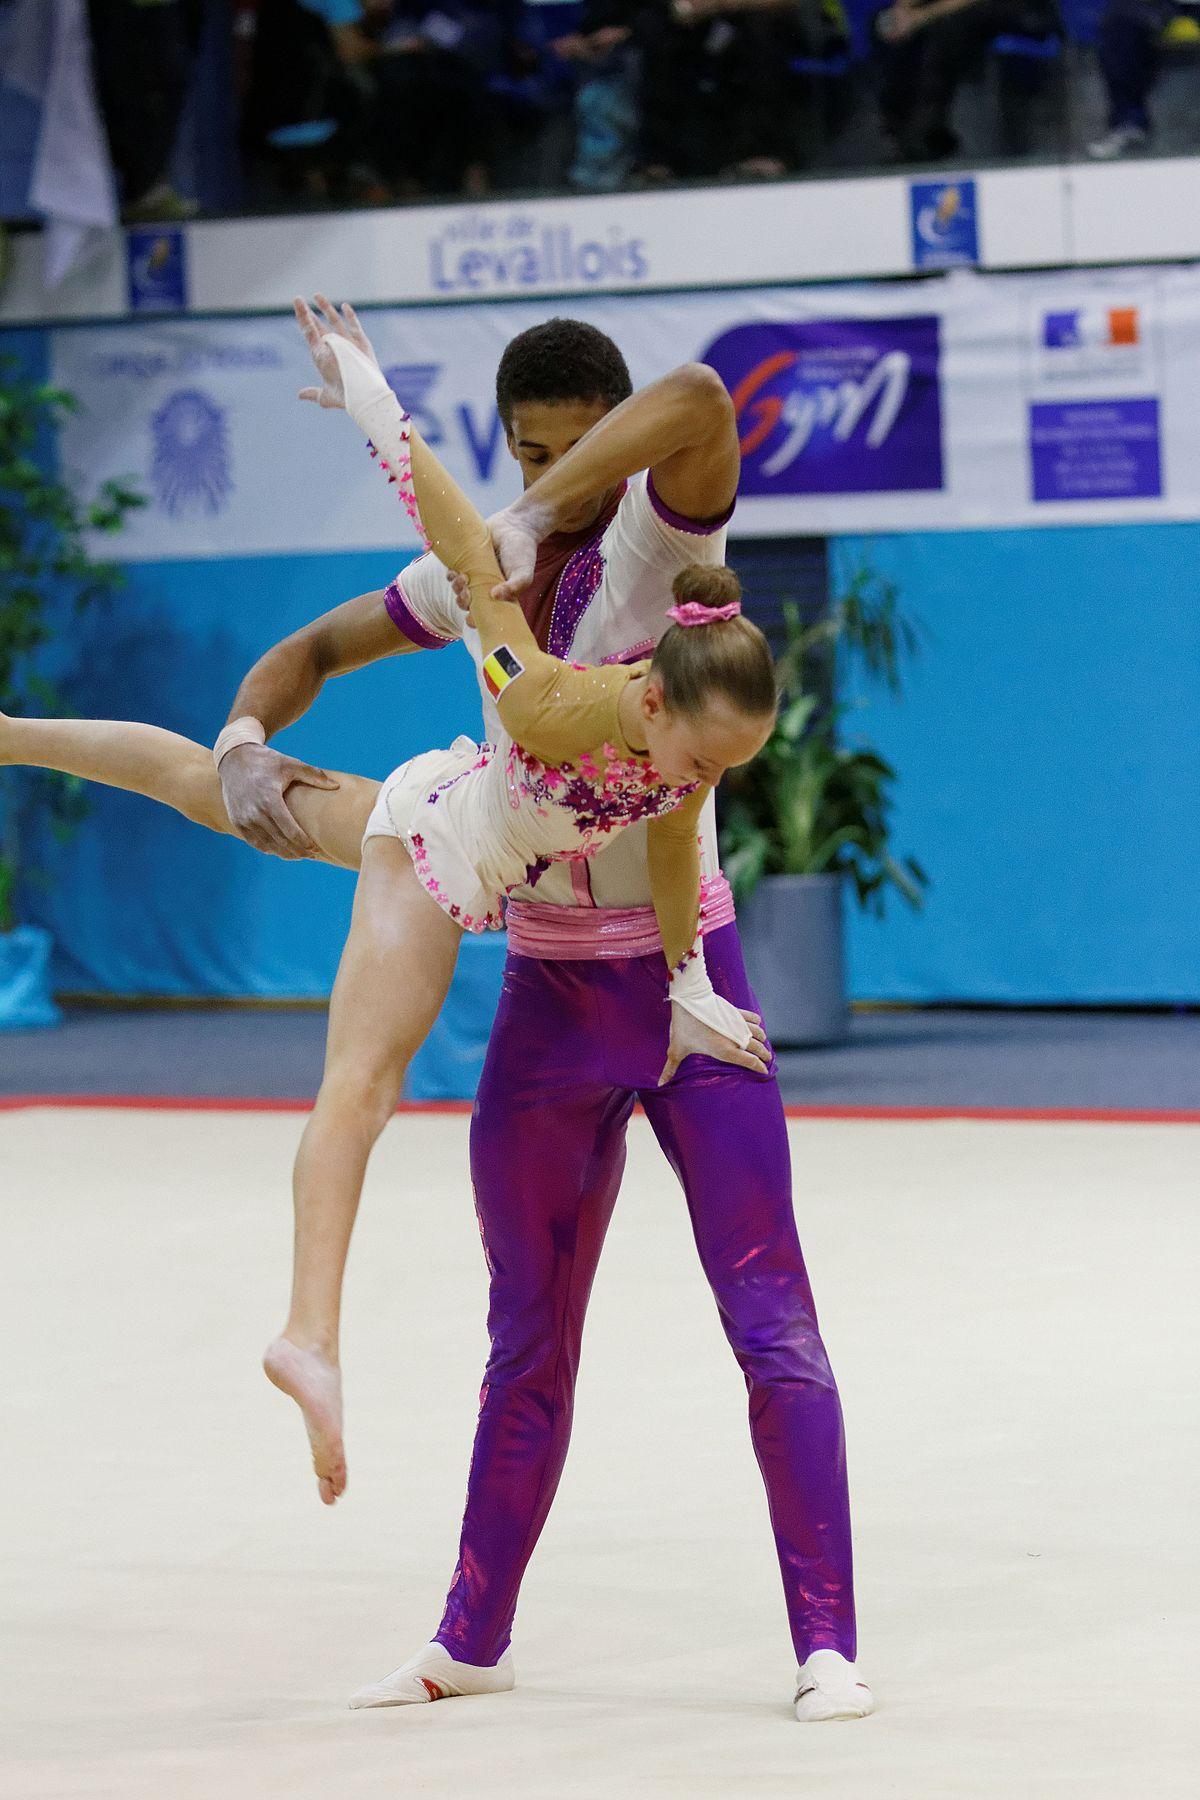 Yana Vastavel - Wikidata Acrobatic Gymnastics Mixed Pair